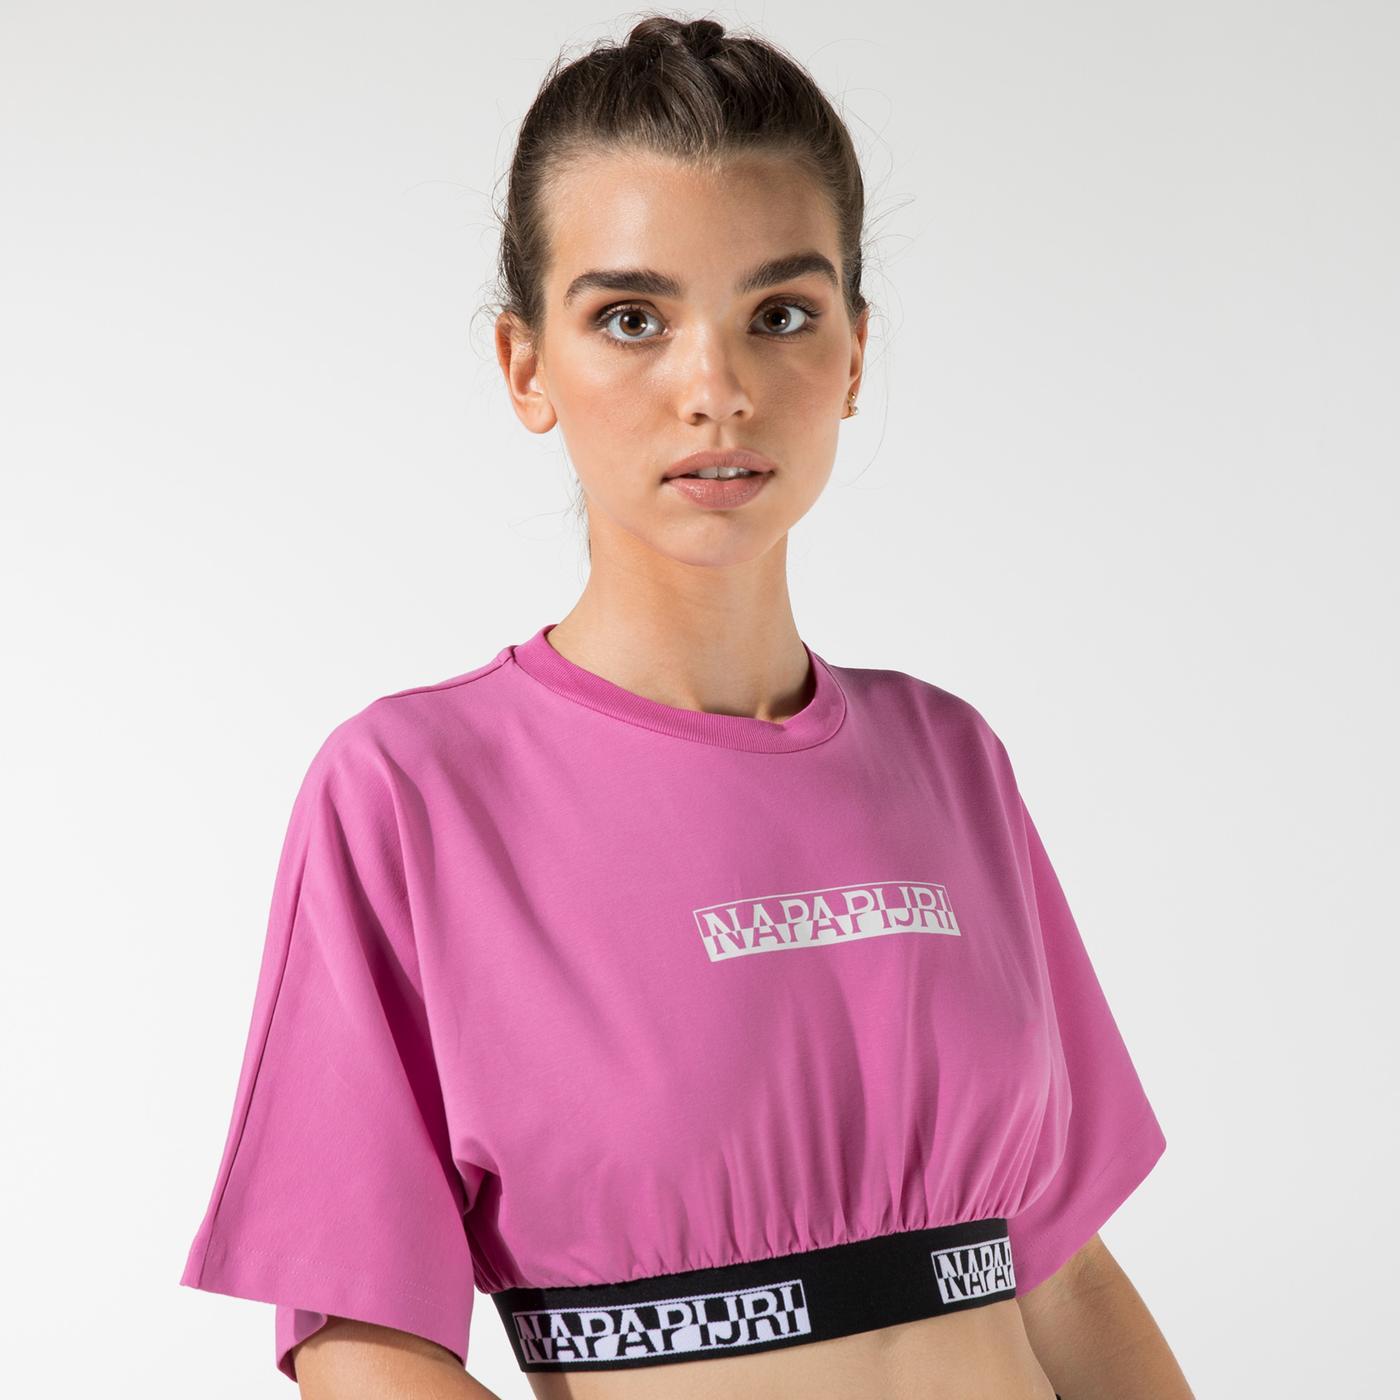 Napapijri Kadın Pembe T-Shirt